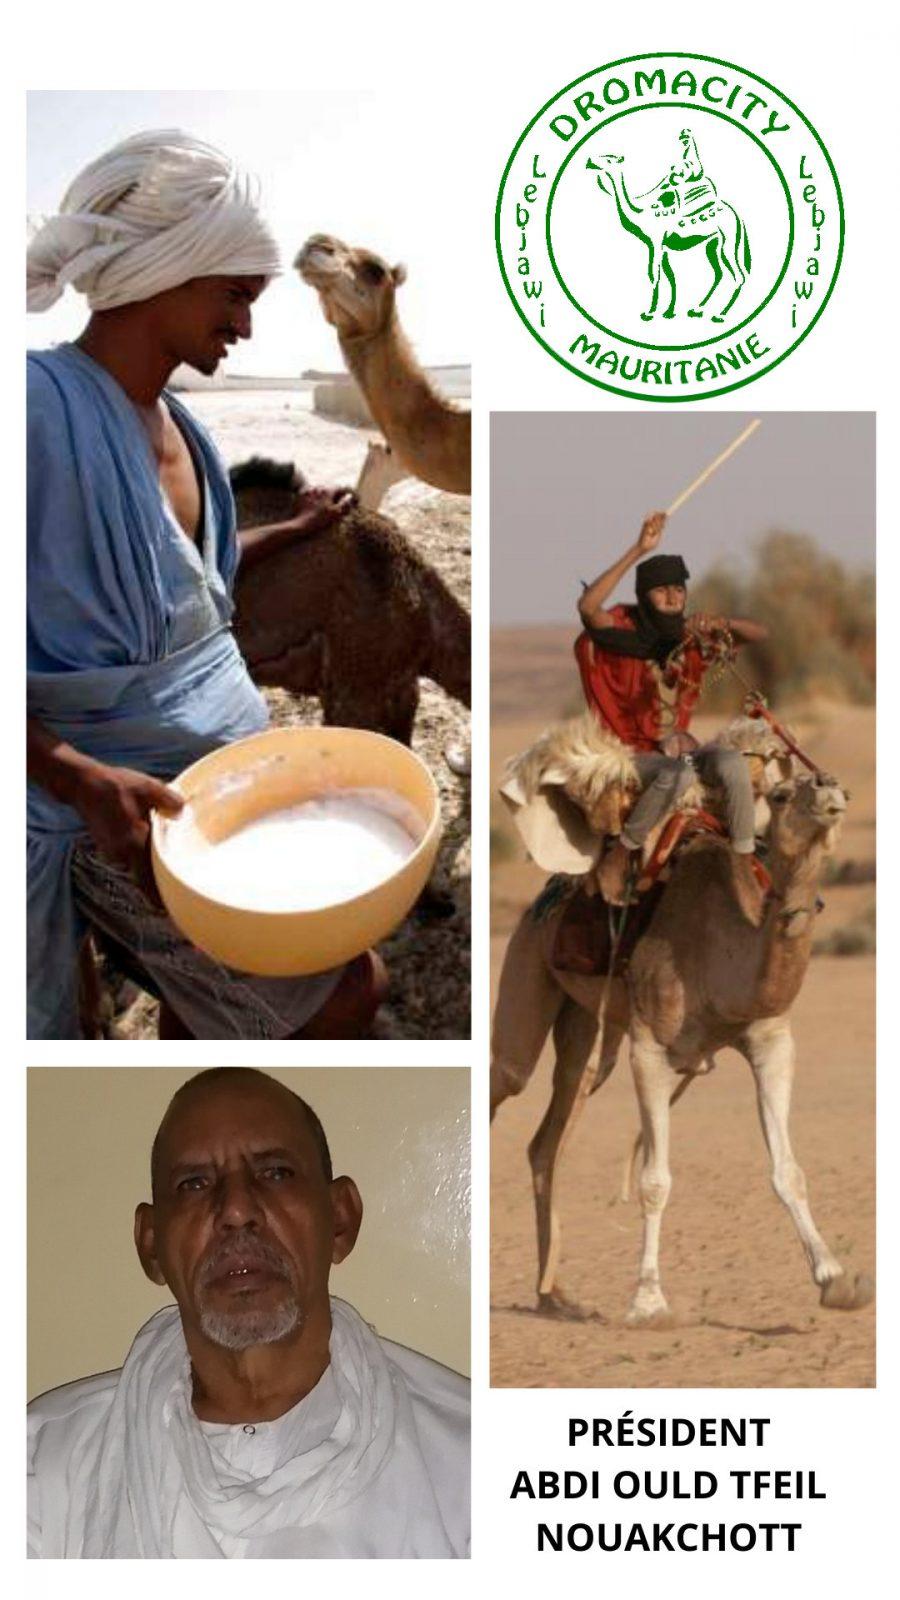 Mauritanie DromaCity